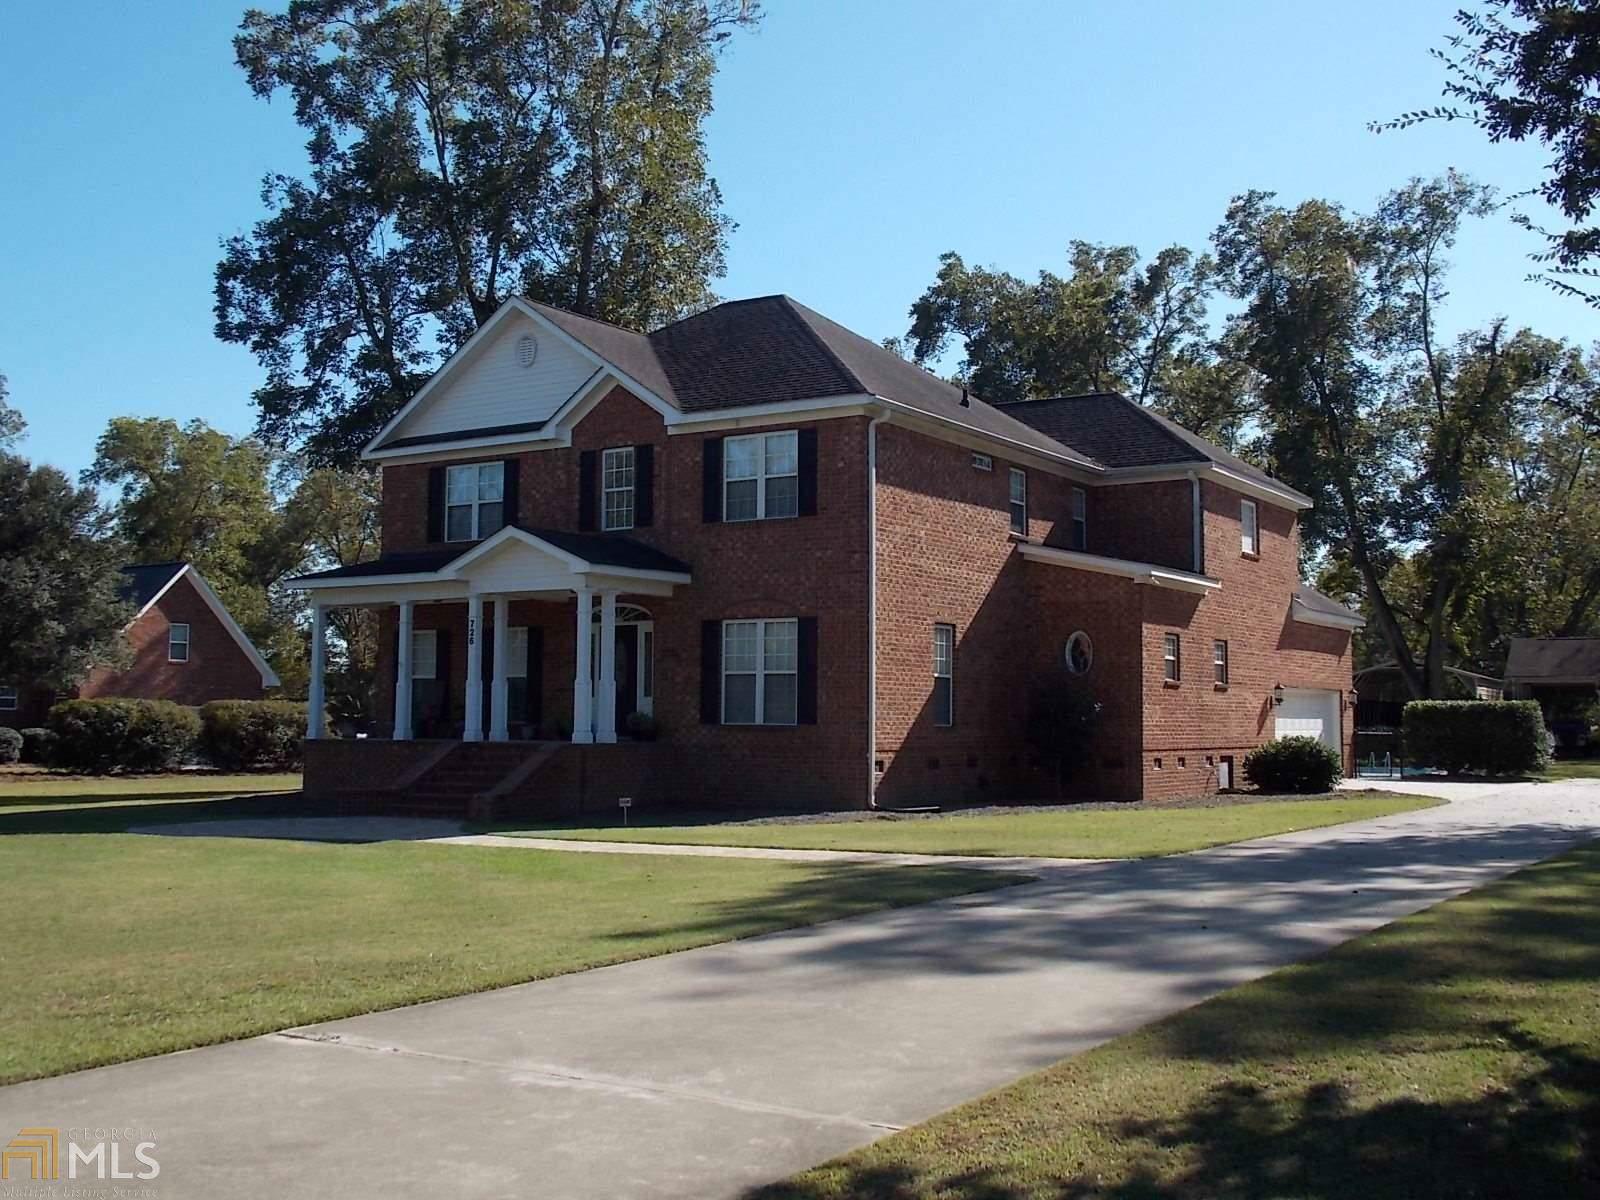 726 West Lane St, Brooklet, GA 30415 (MLS #8594008) :: RE/MAX Eagle Creek Realty